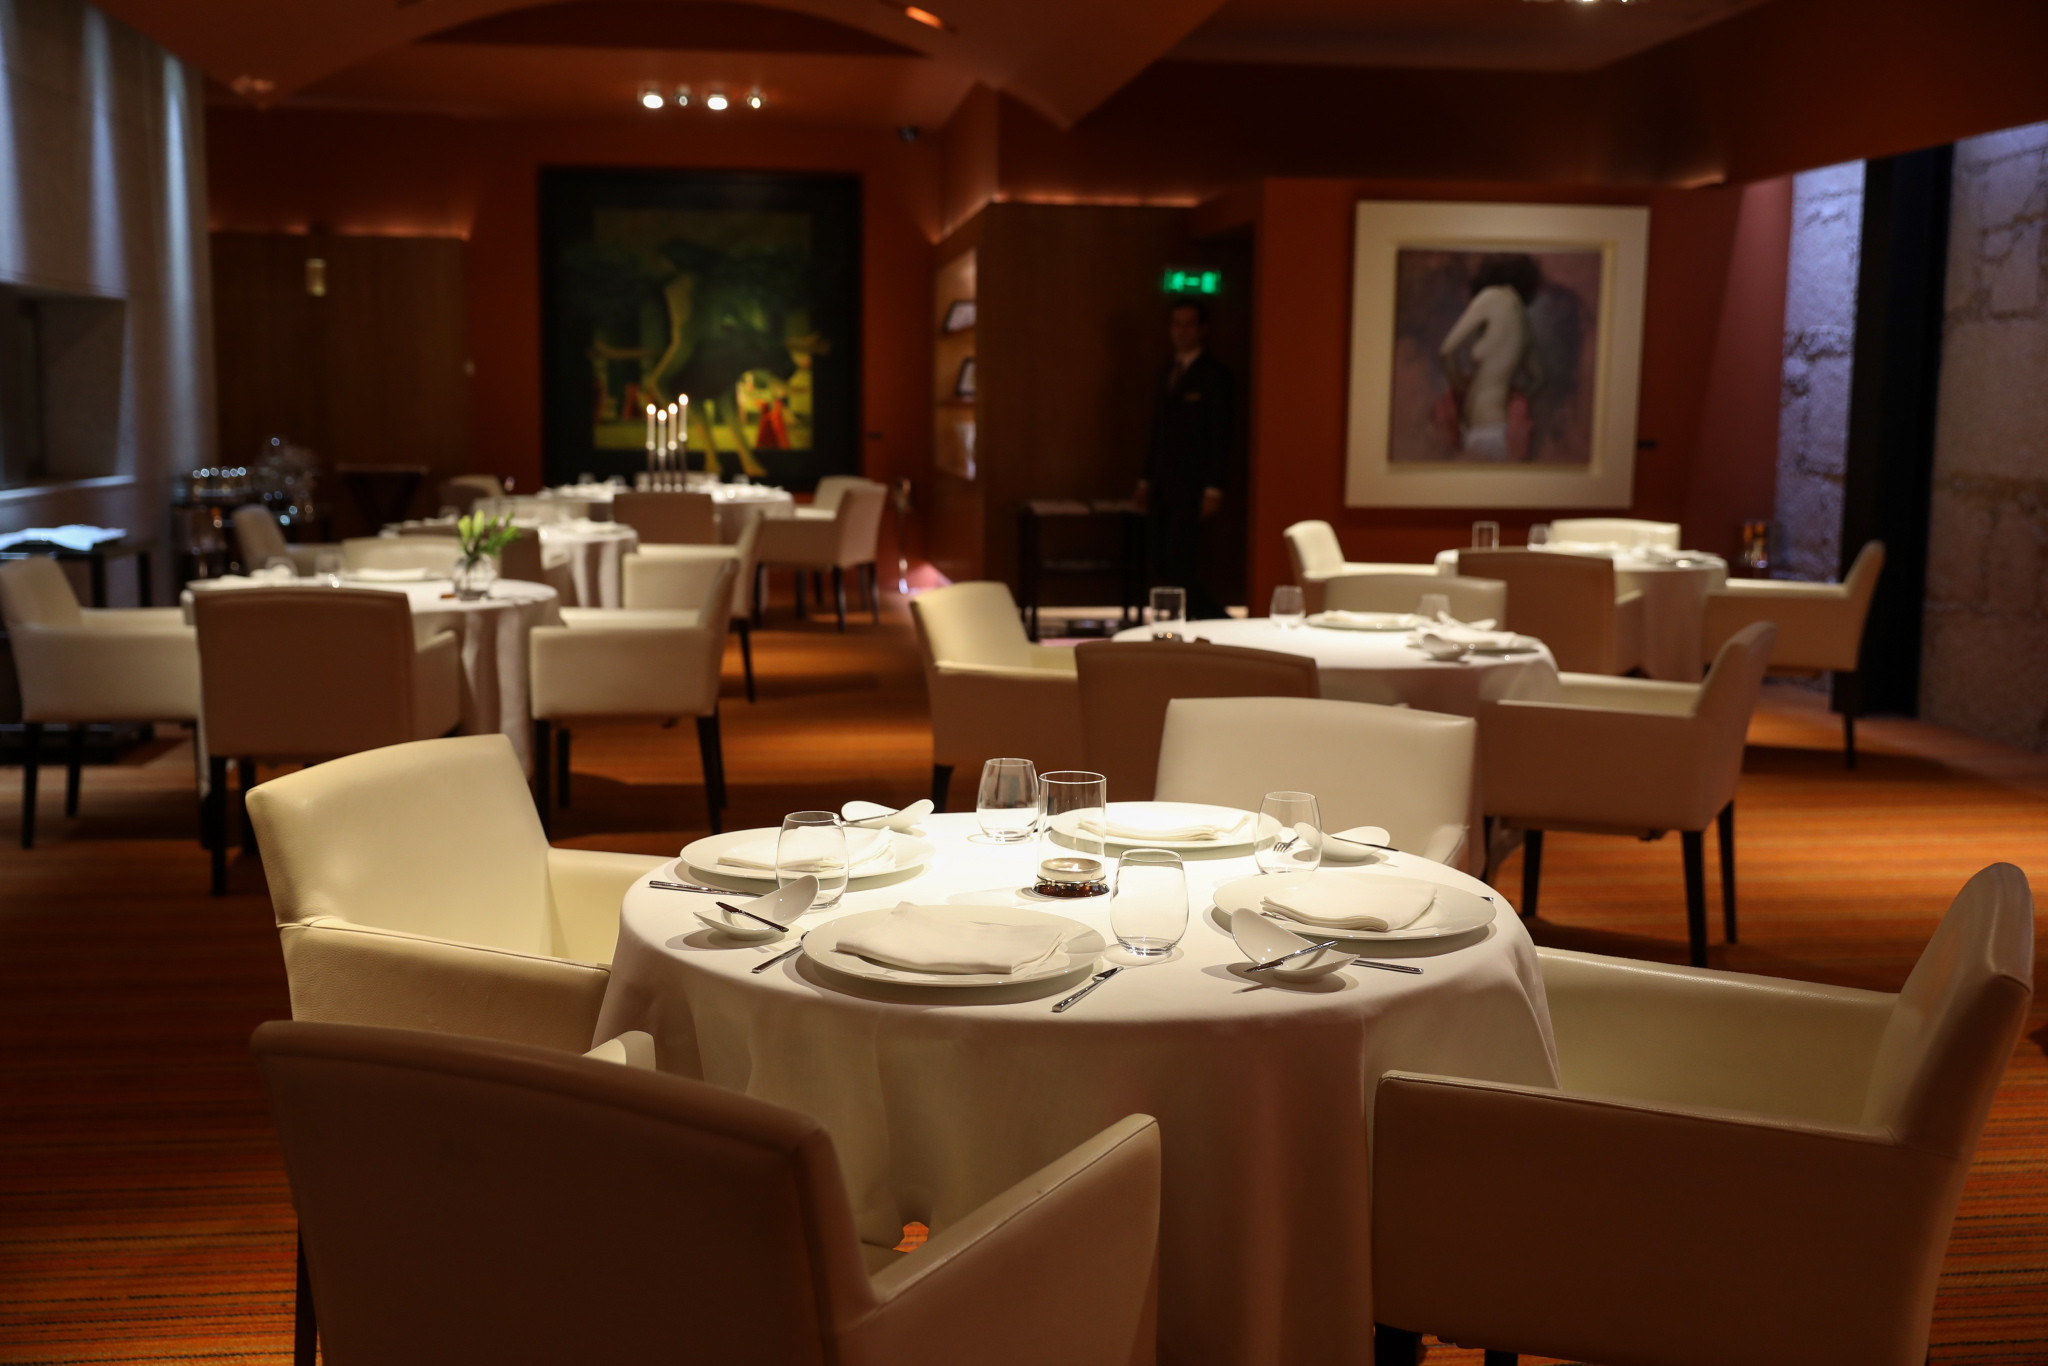 2048_LM Restaurante Egoista 10.jpg